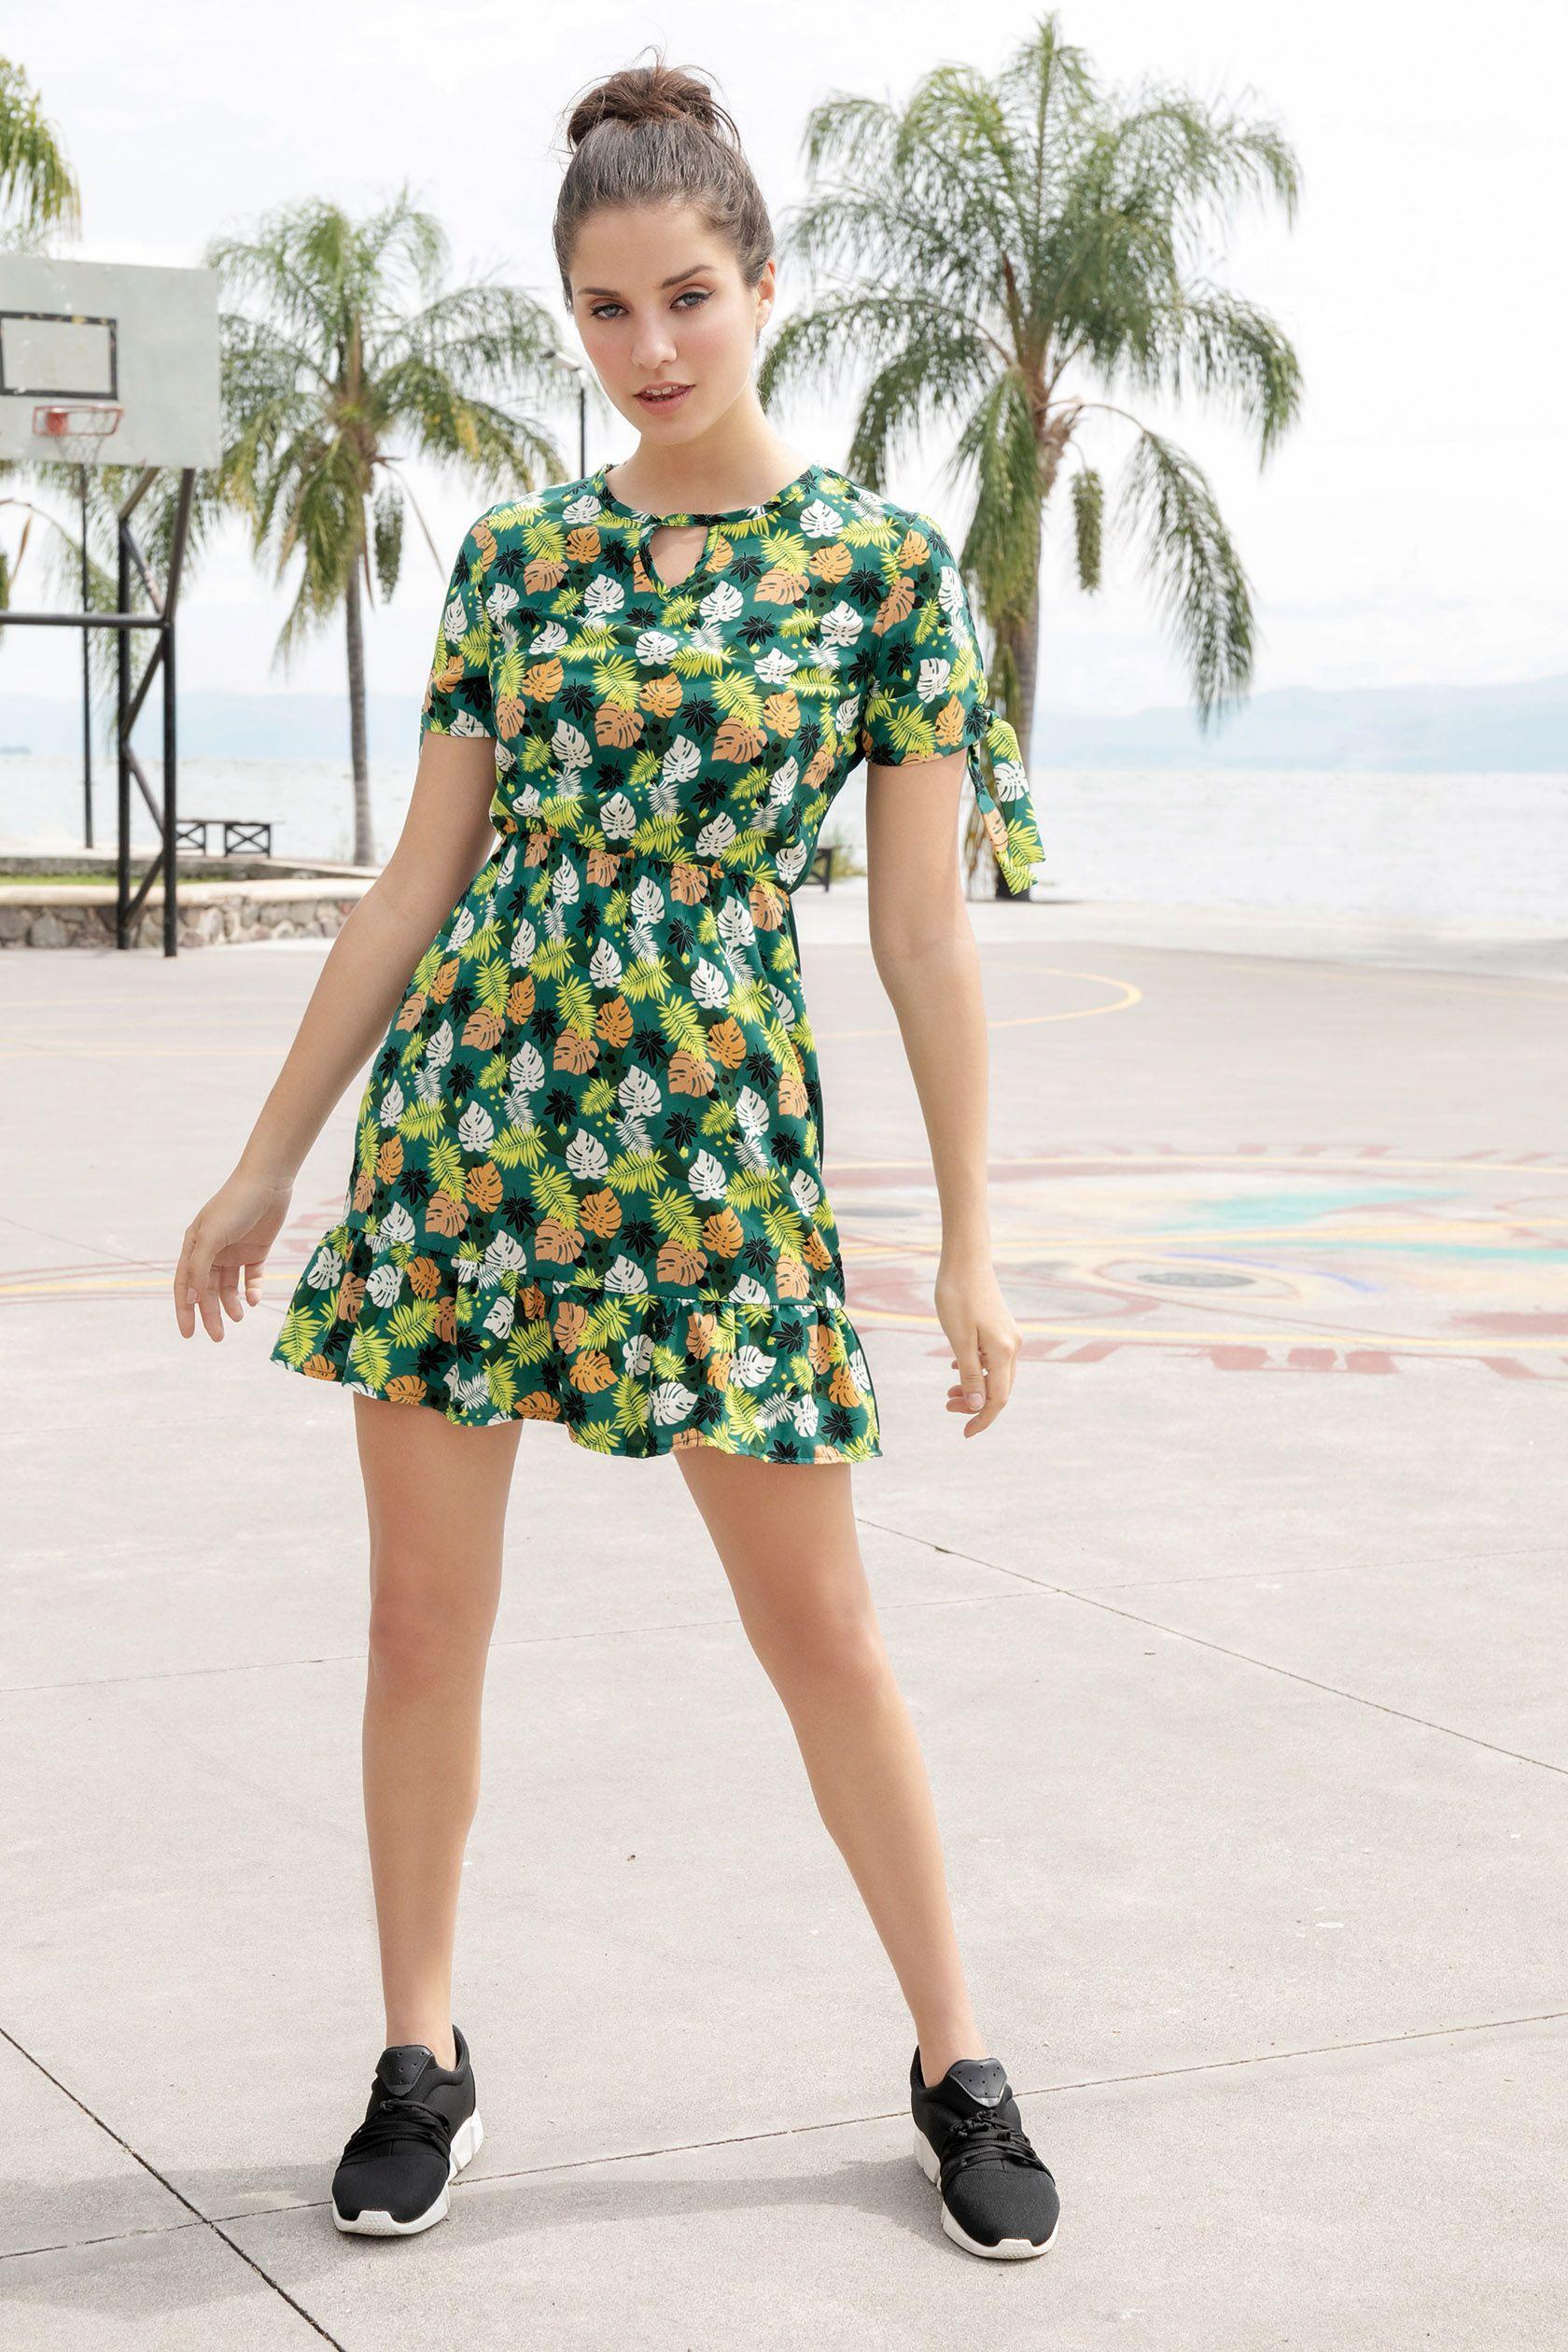 Rinna Pv 2020 Rinna Bruni Outfits Catalogos De Ropa